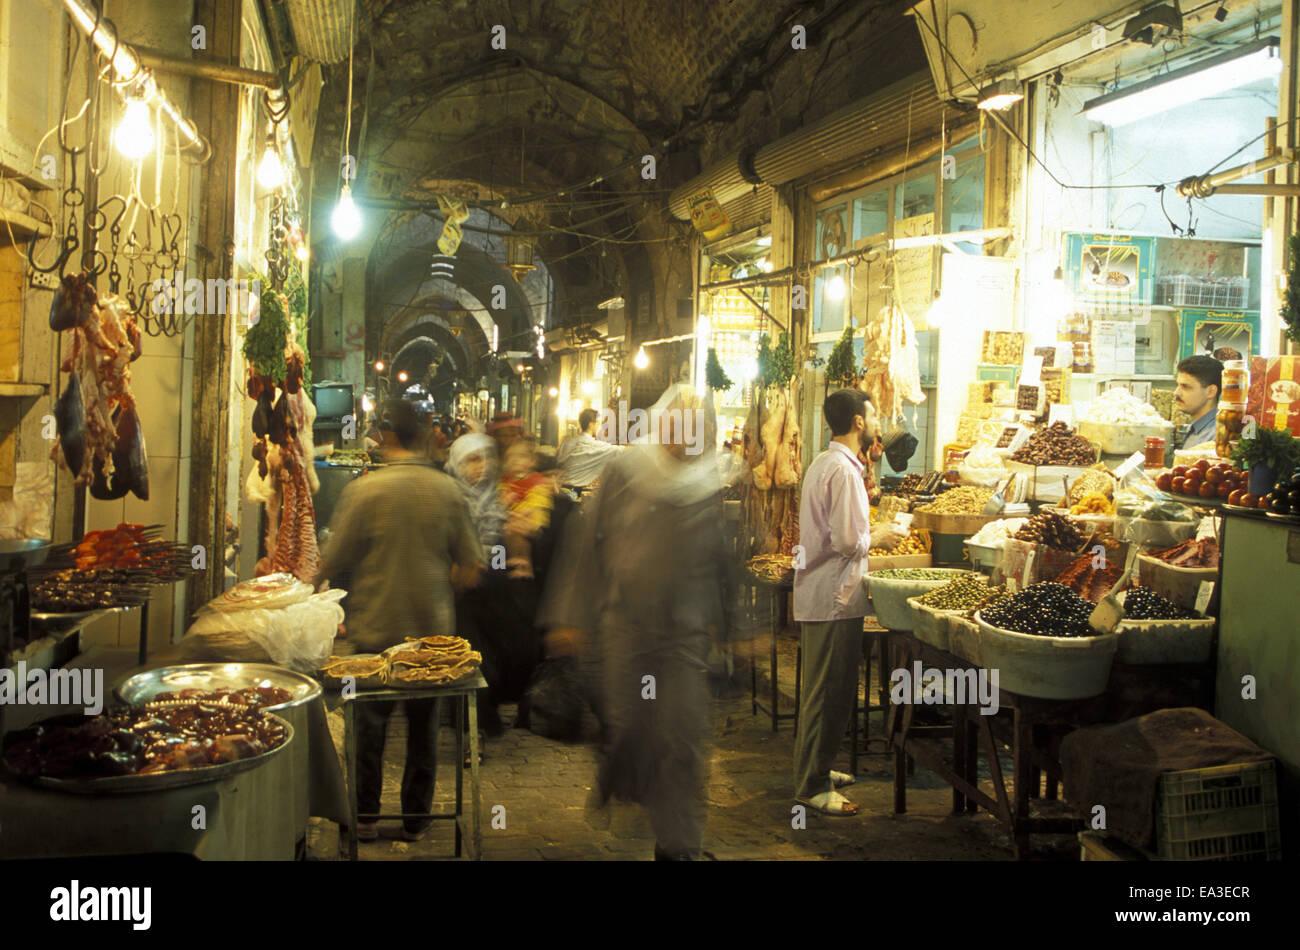 SYRIEN - Stock Image